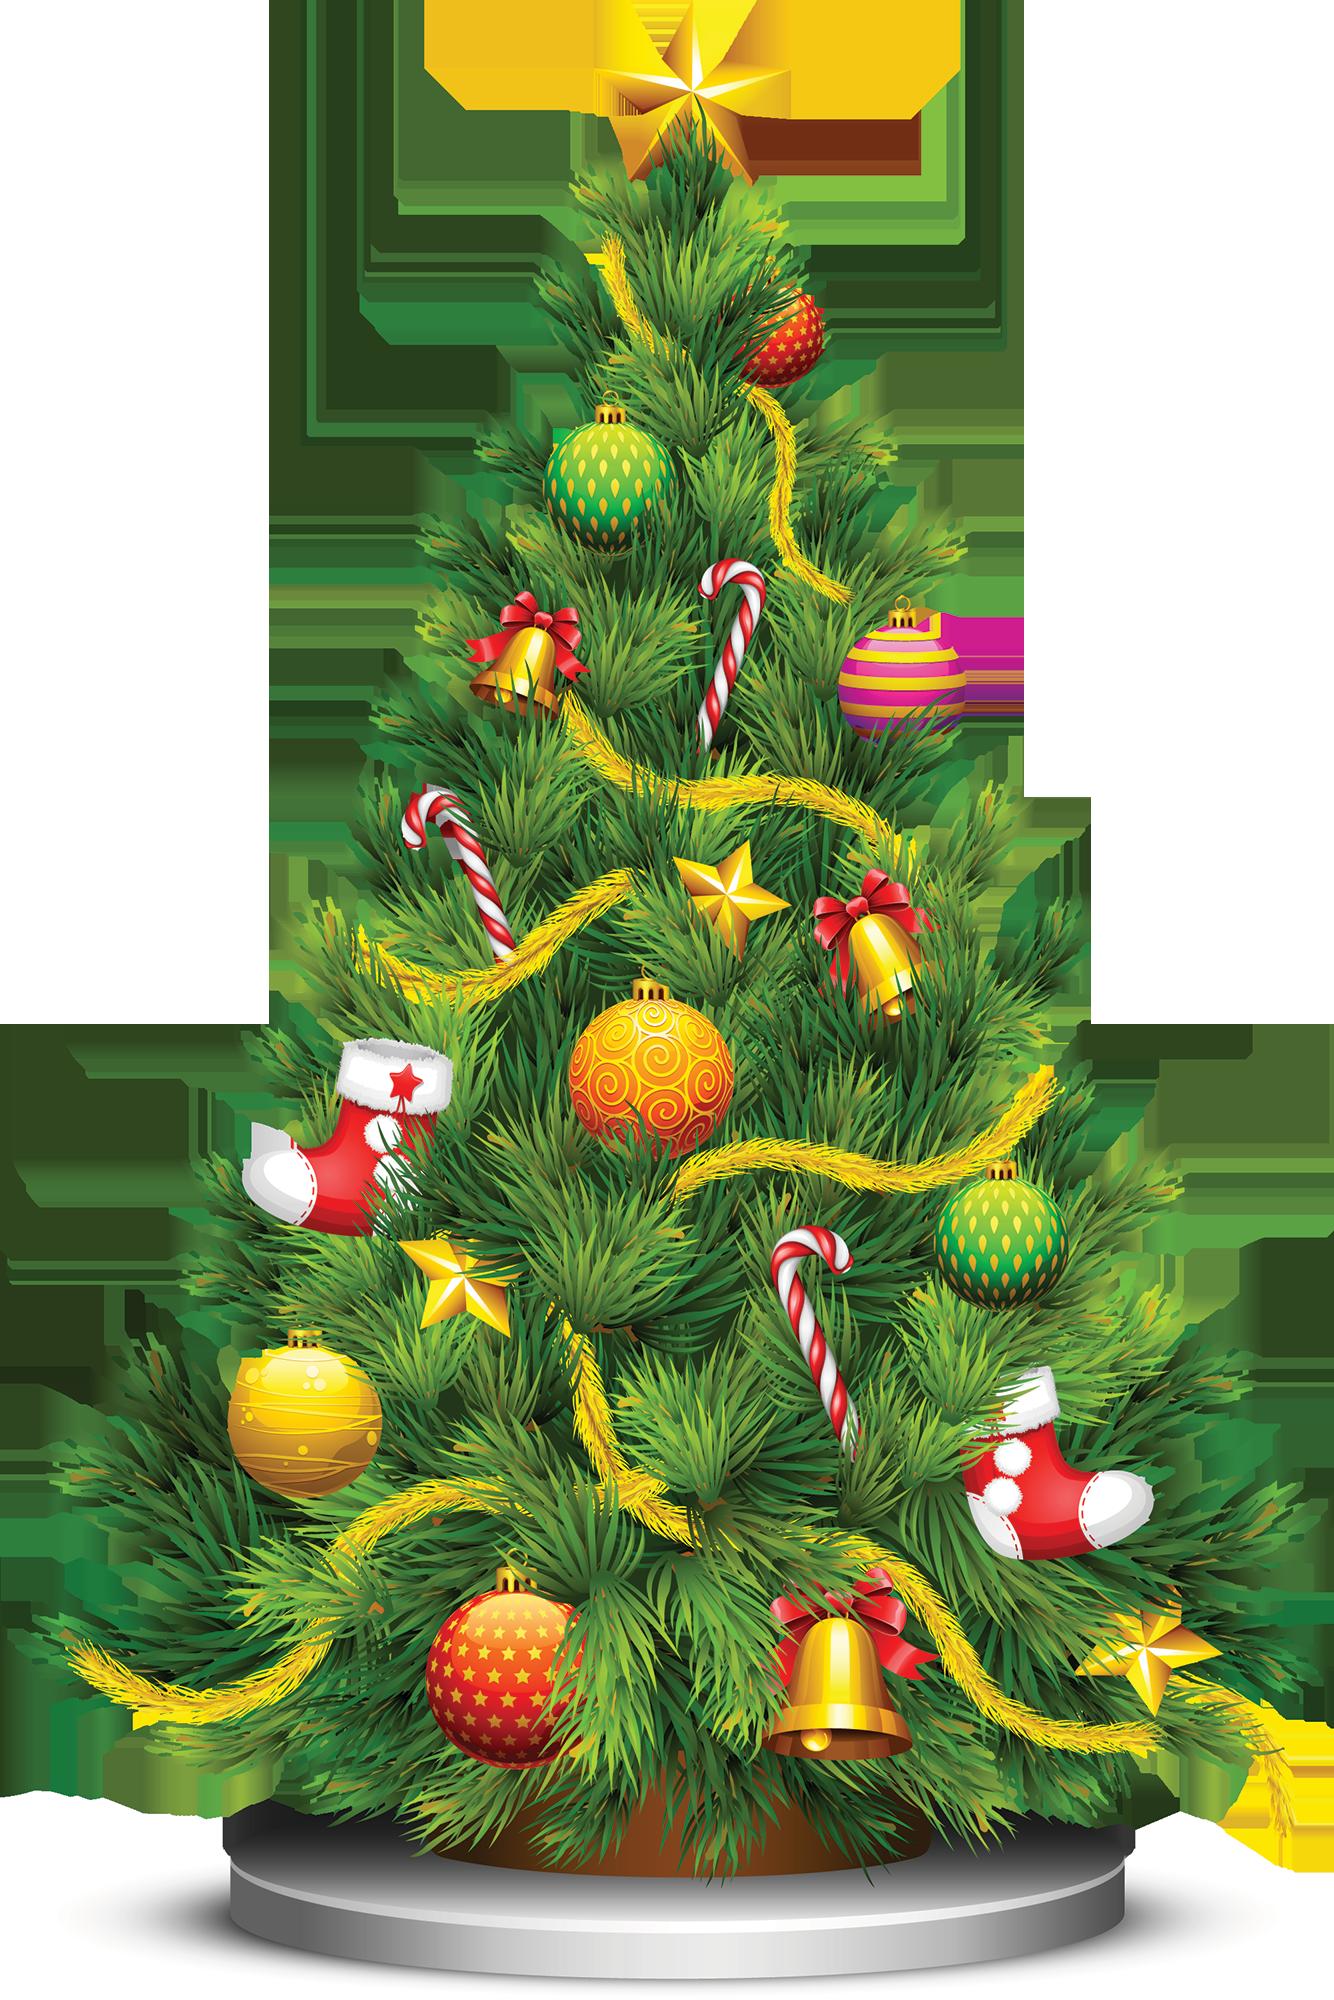 Pin by Dara Tata on КЛИПАРТ - новогодний | Pinterest | Christmas ... graphic transparent